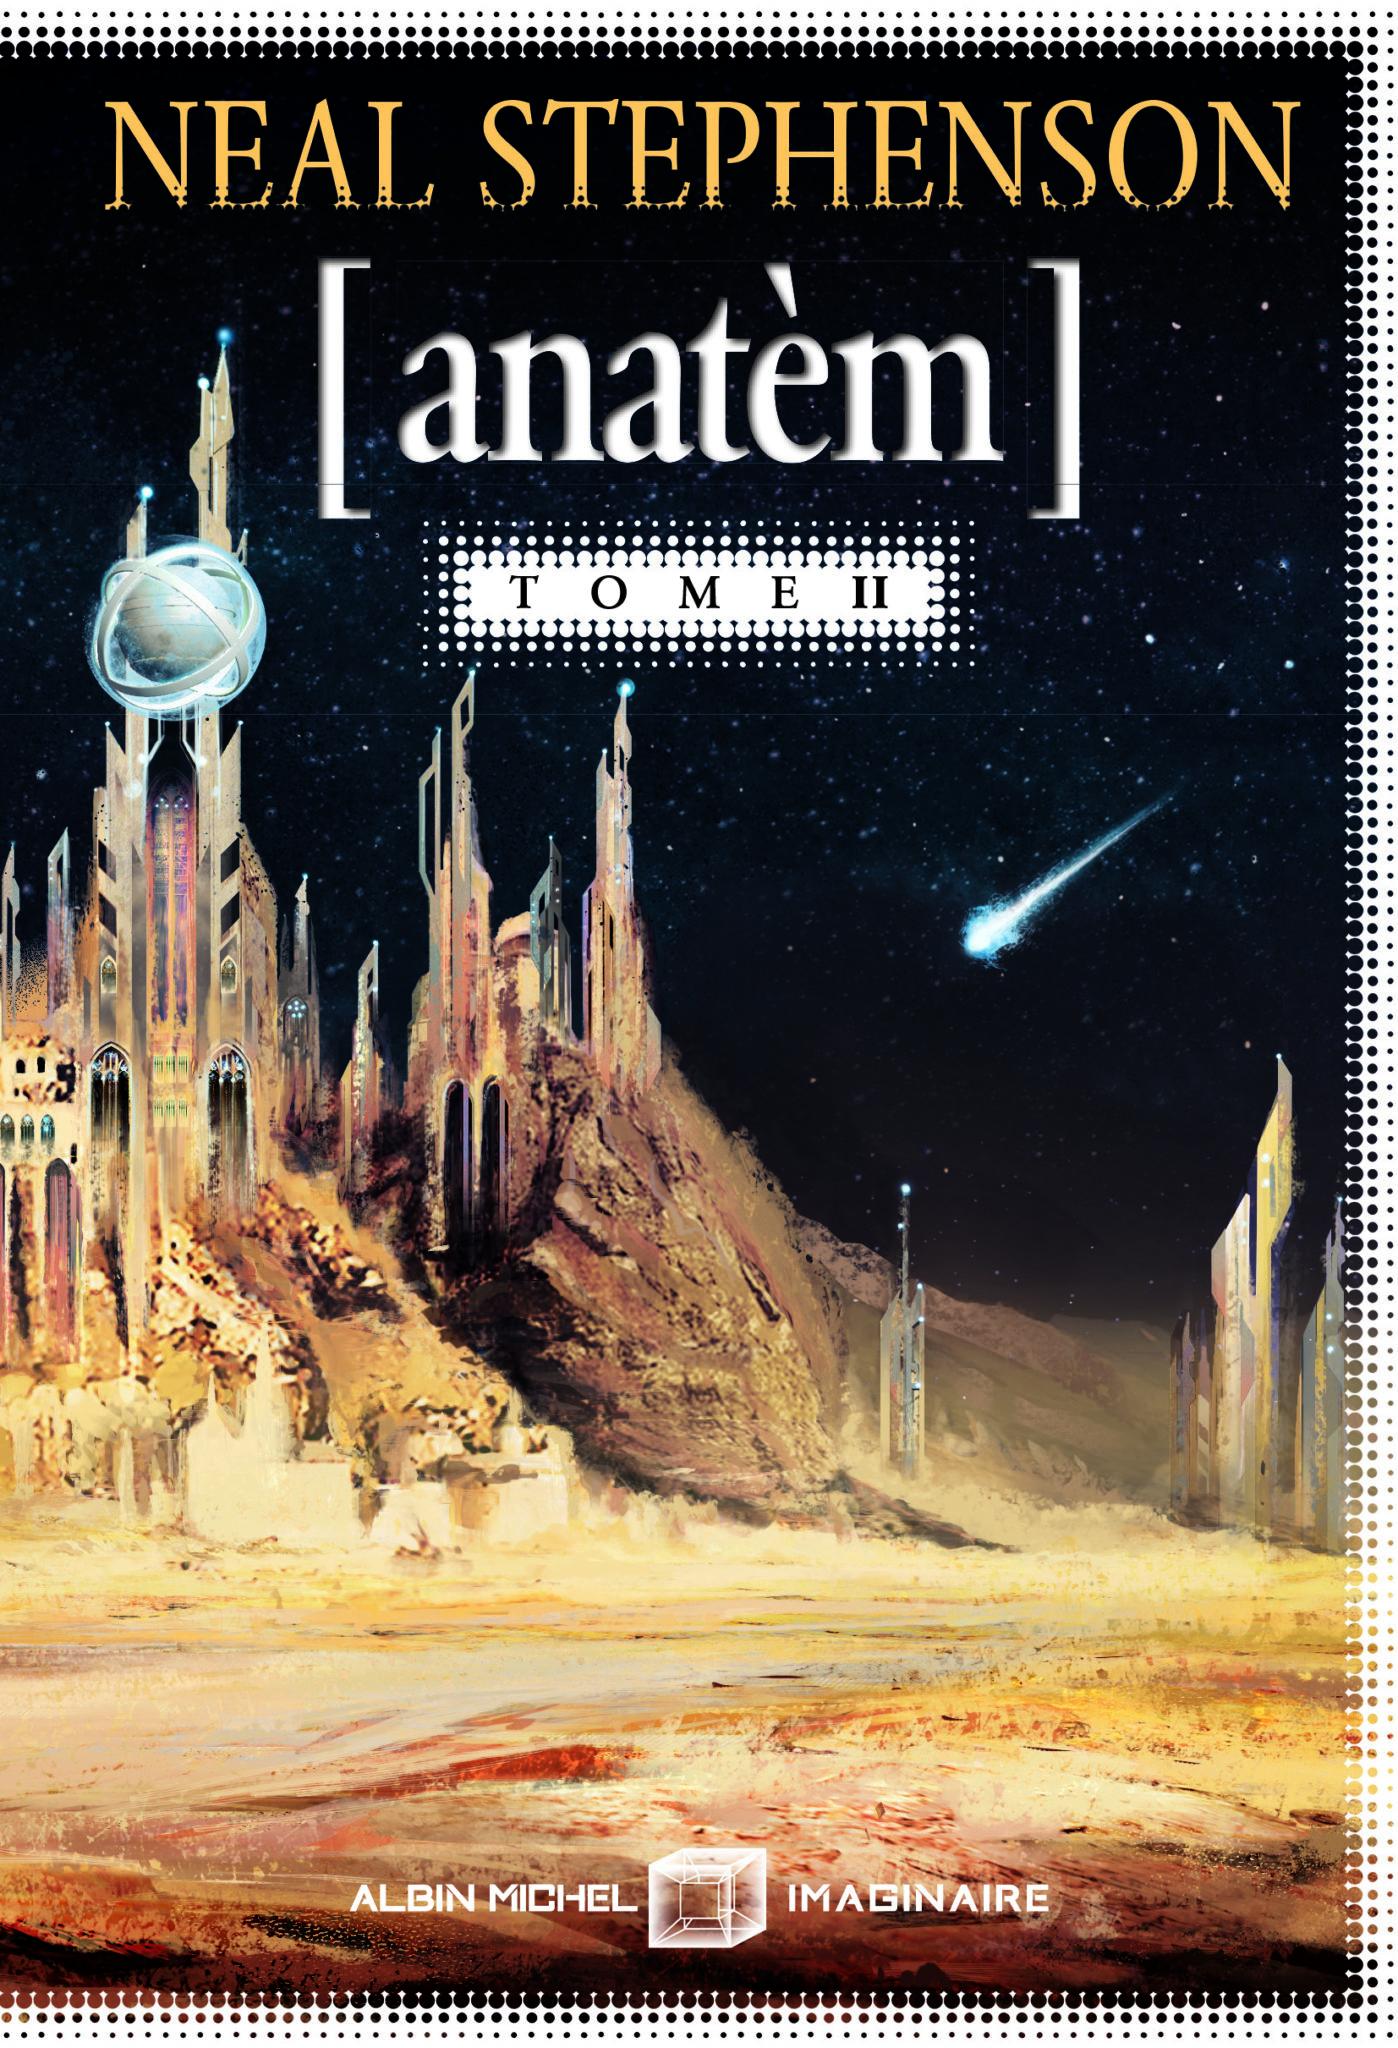 albin_michel_imaginaire_neal_stephenson_anatem_tome_2_HD